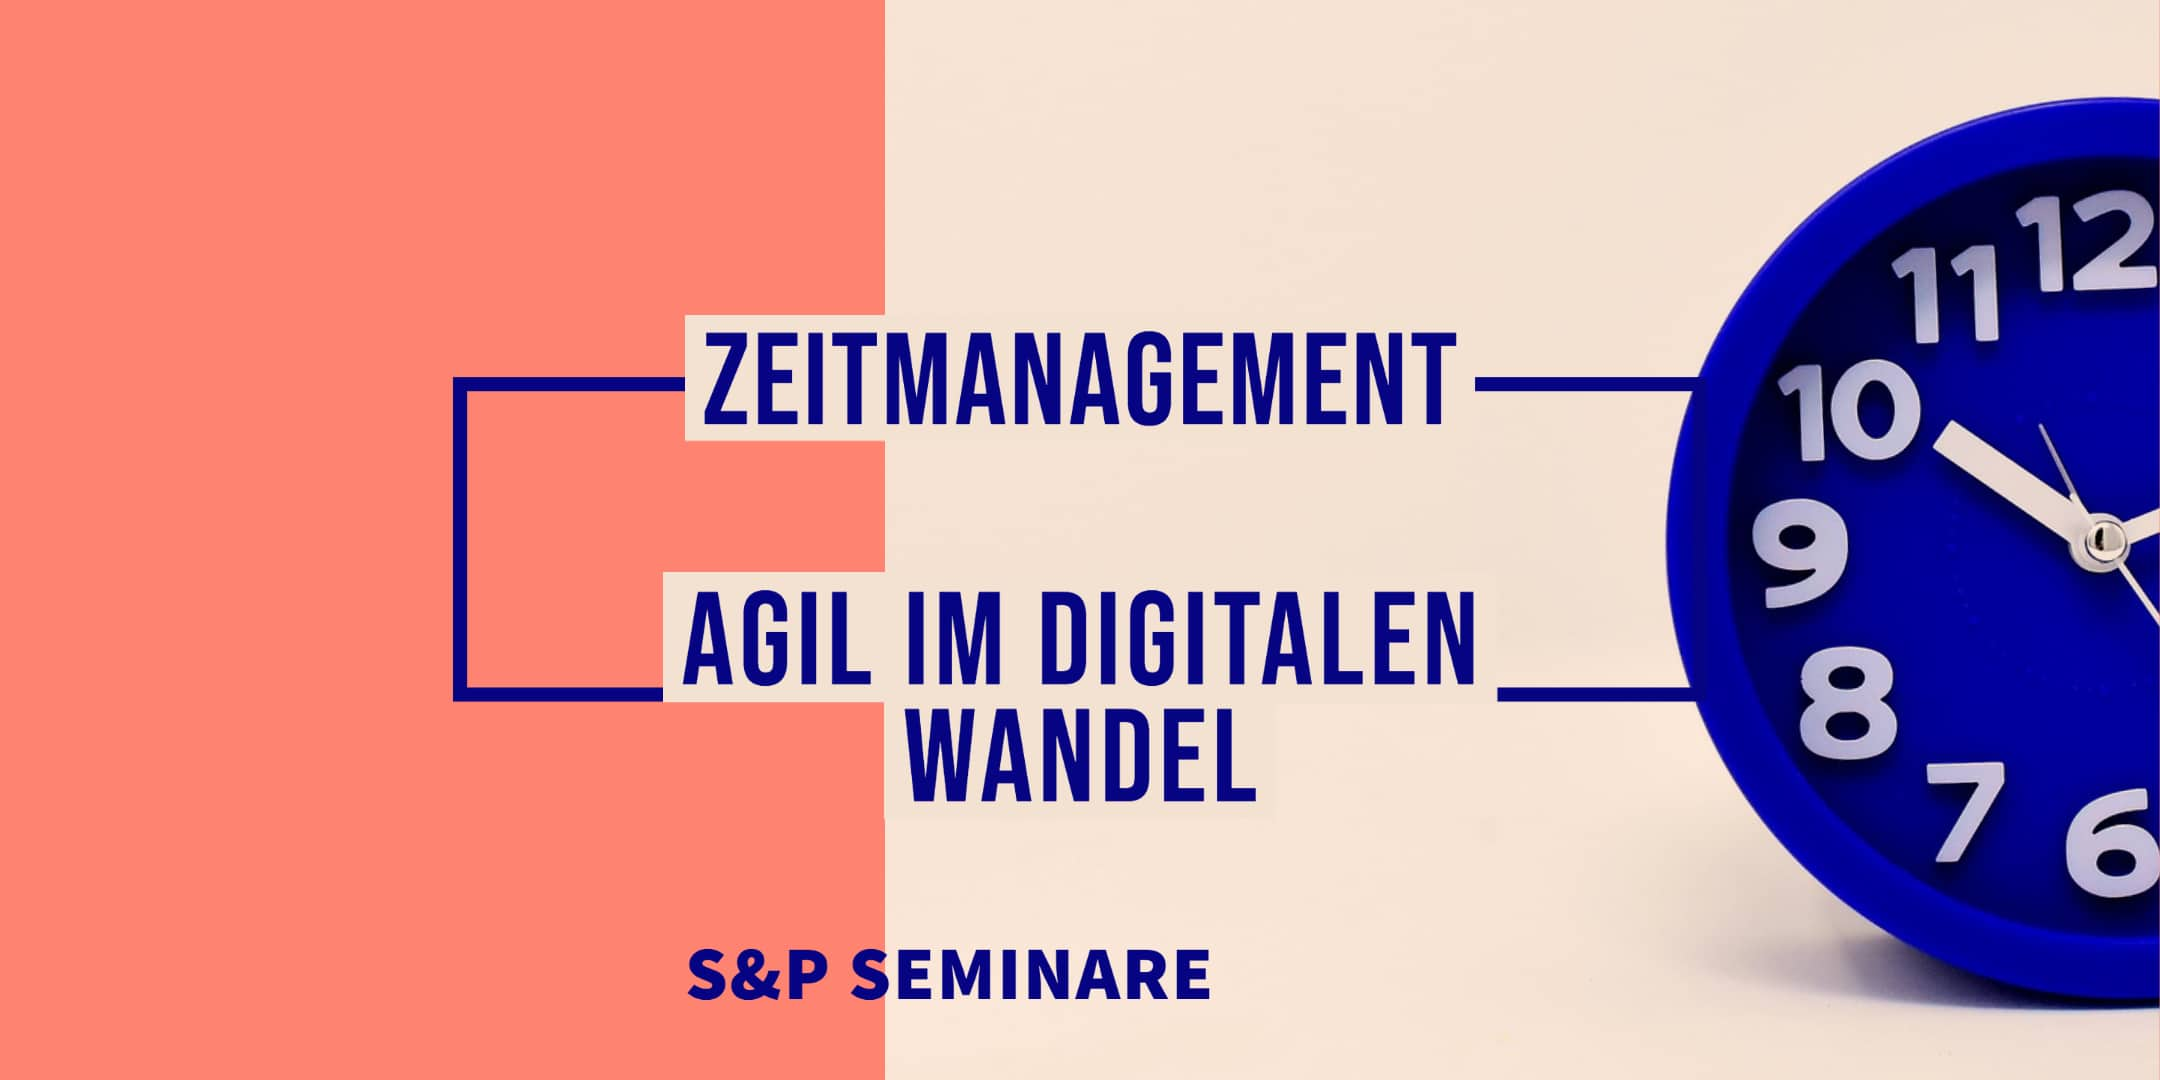 Seminare Zeitmanagement in Frankfurt